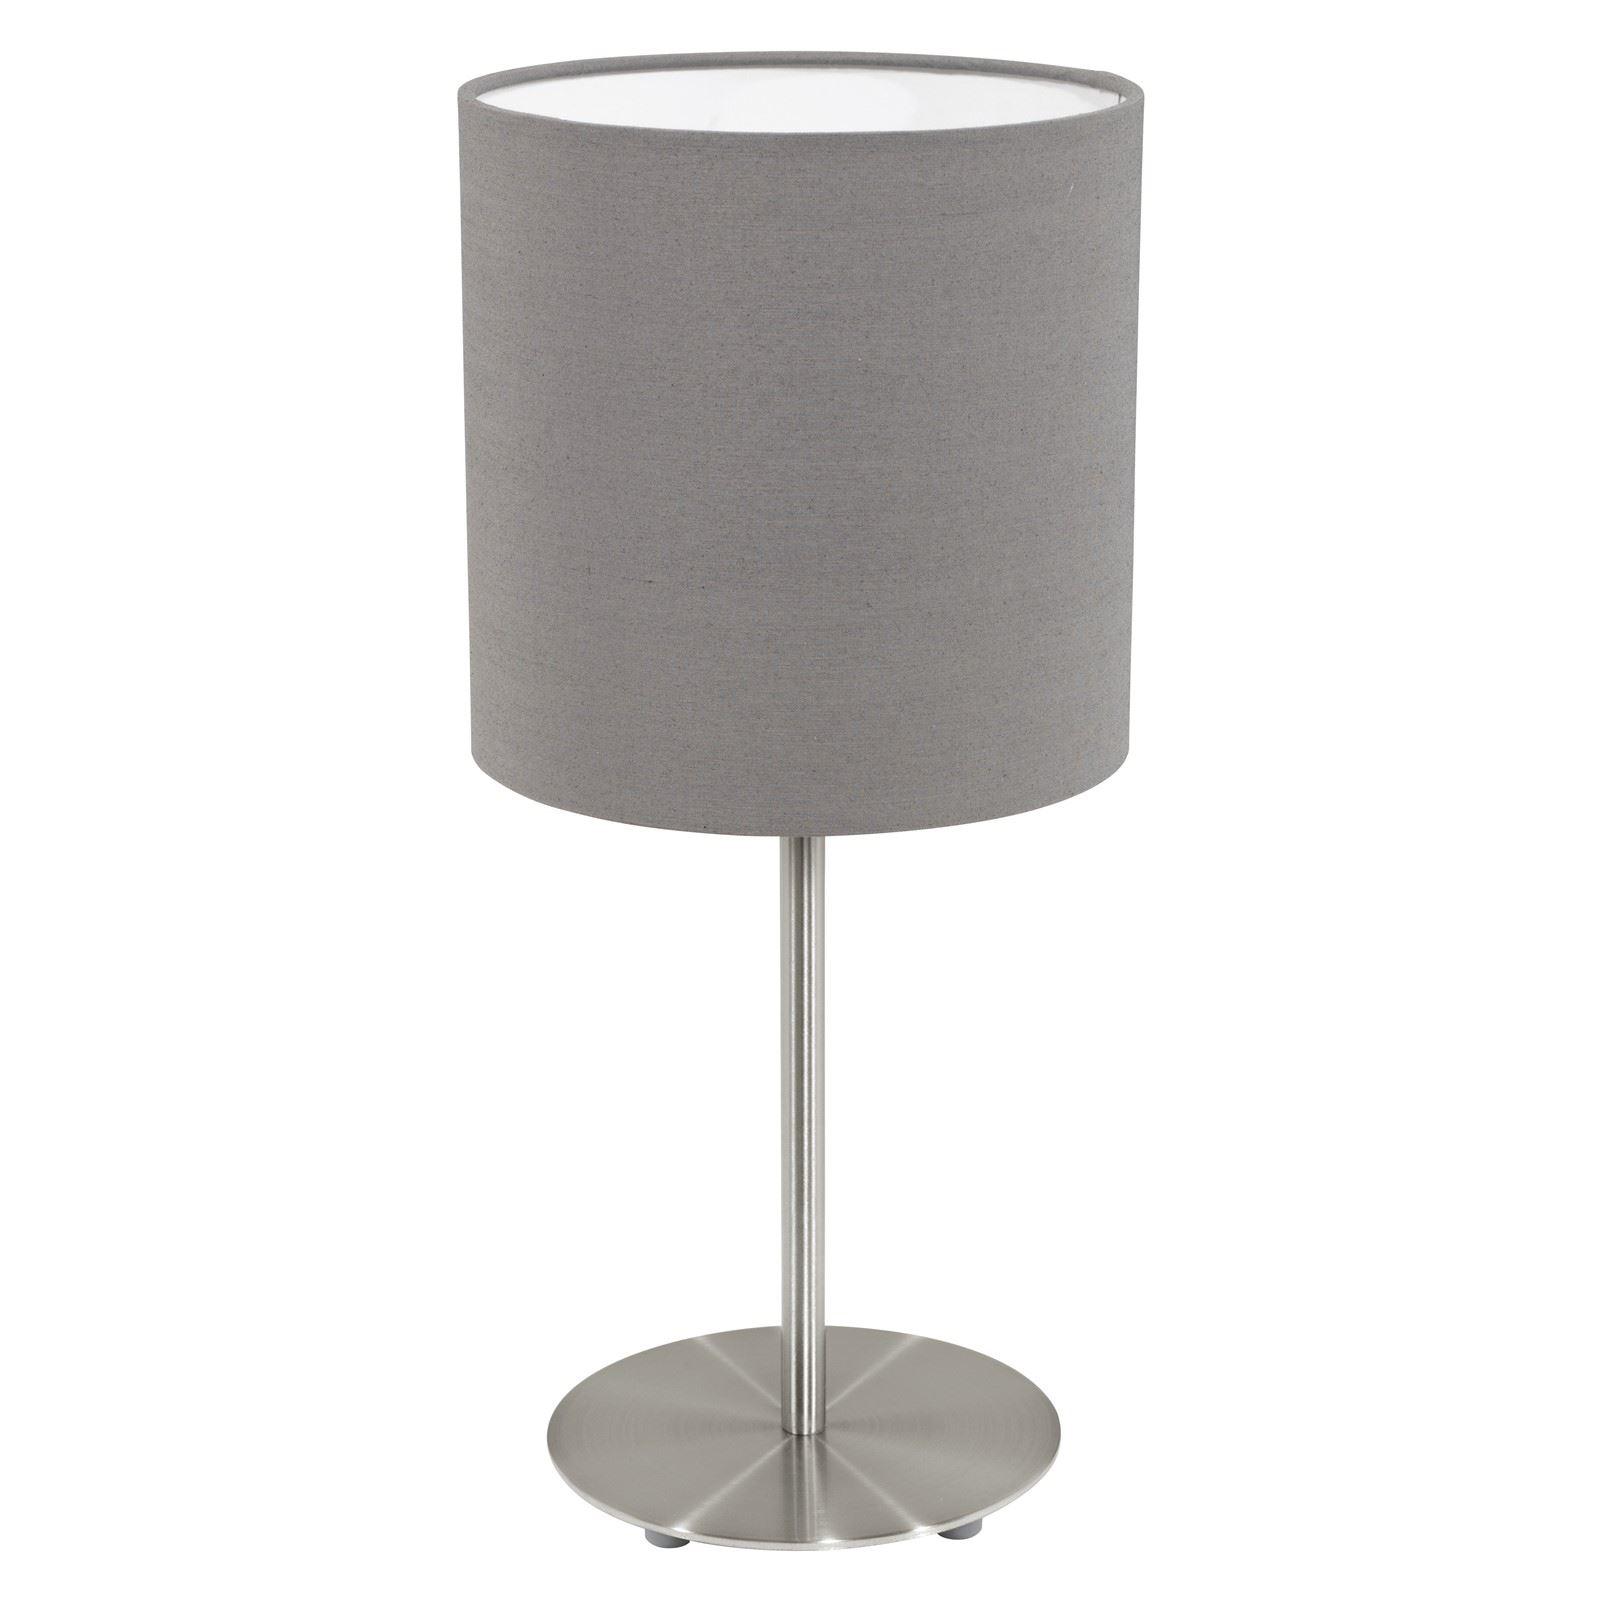 Pasteri Matt Brown Shade Steel Satin Nickel Table Lamp 1 Light E27